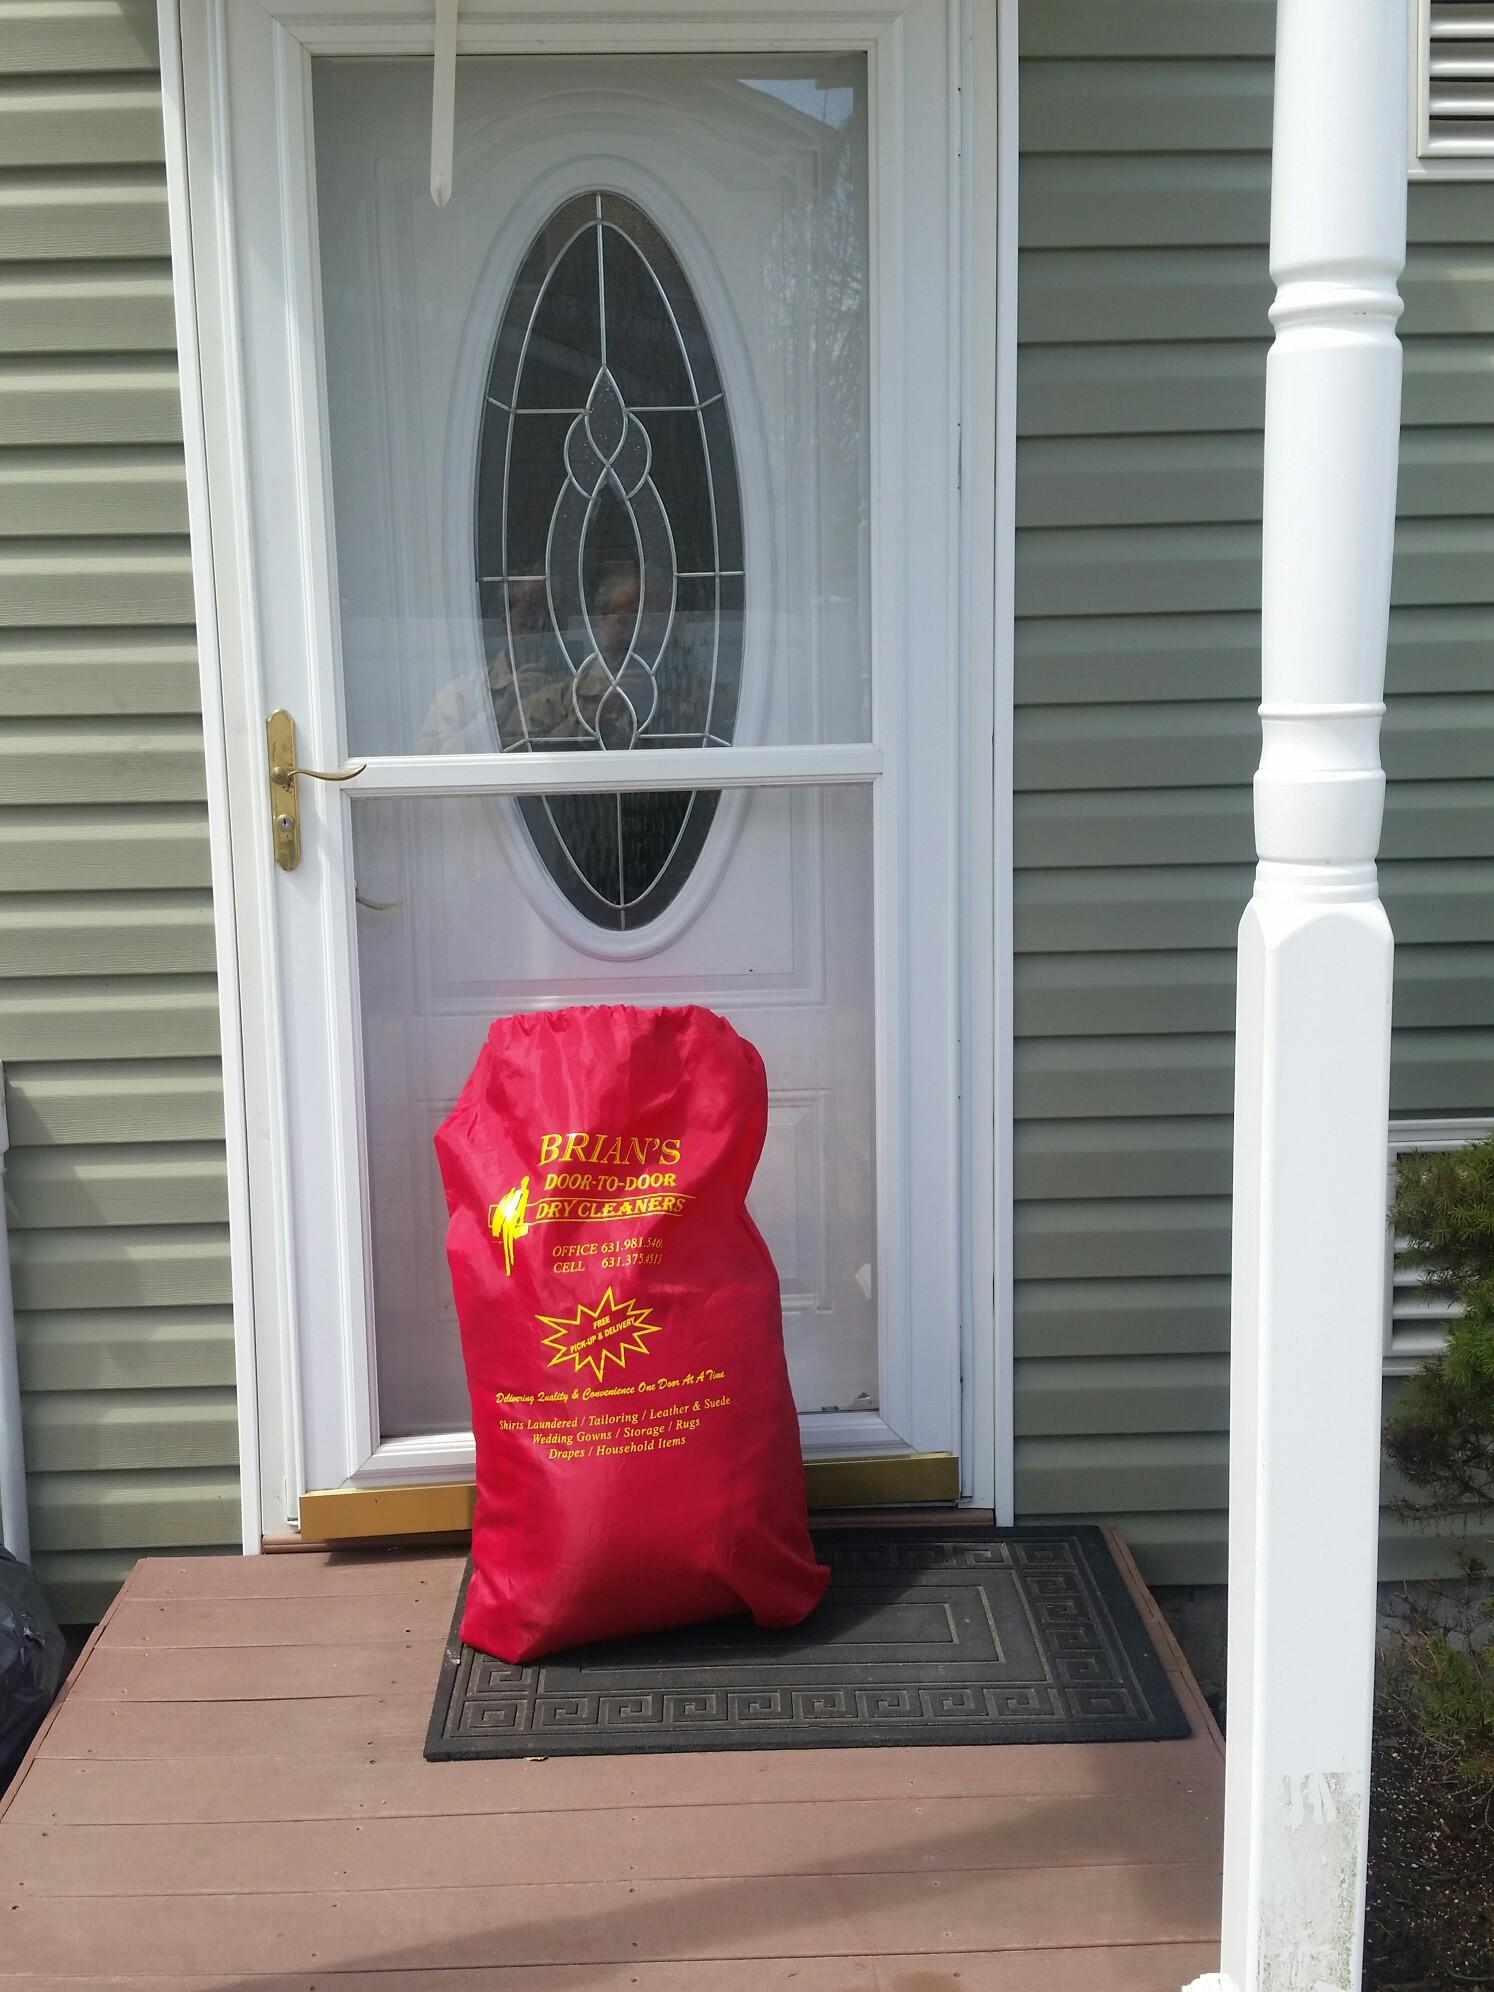 Brians Door To Door Drycleaners 221 Terry Blvd, Holbrook, NY 11741   YP.com